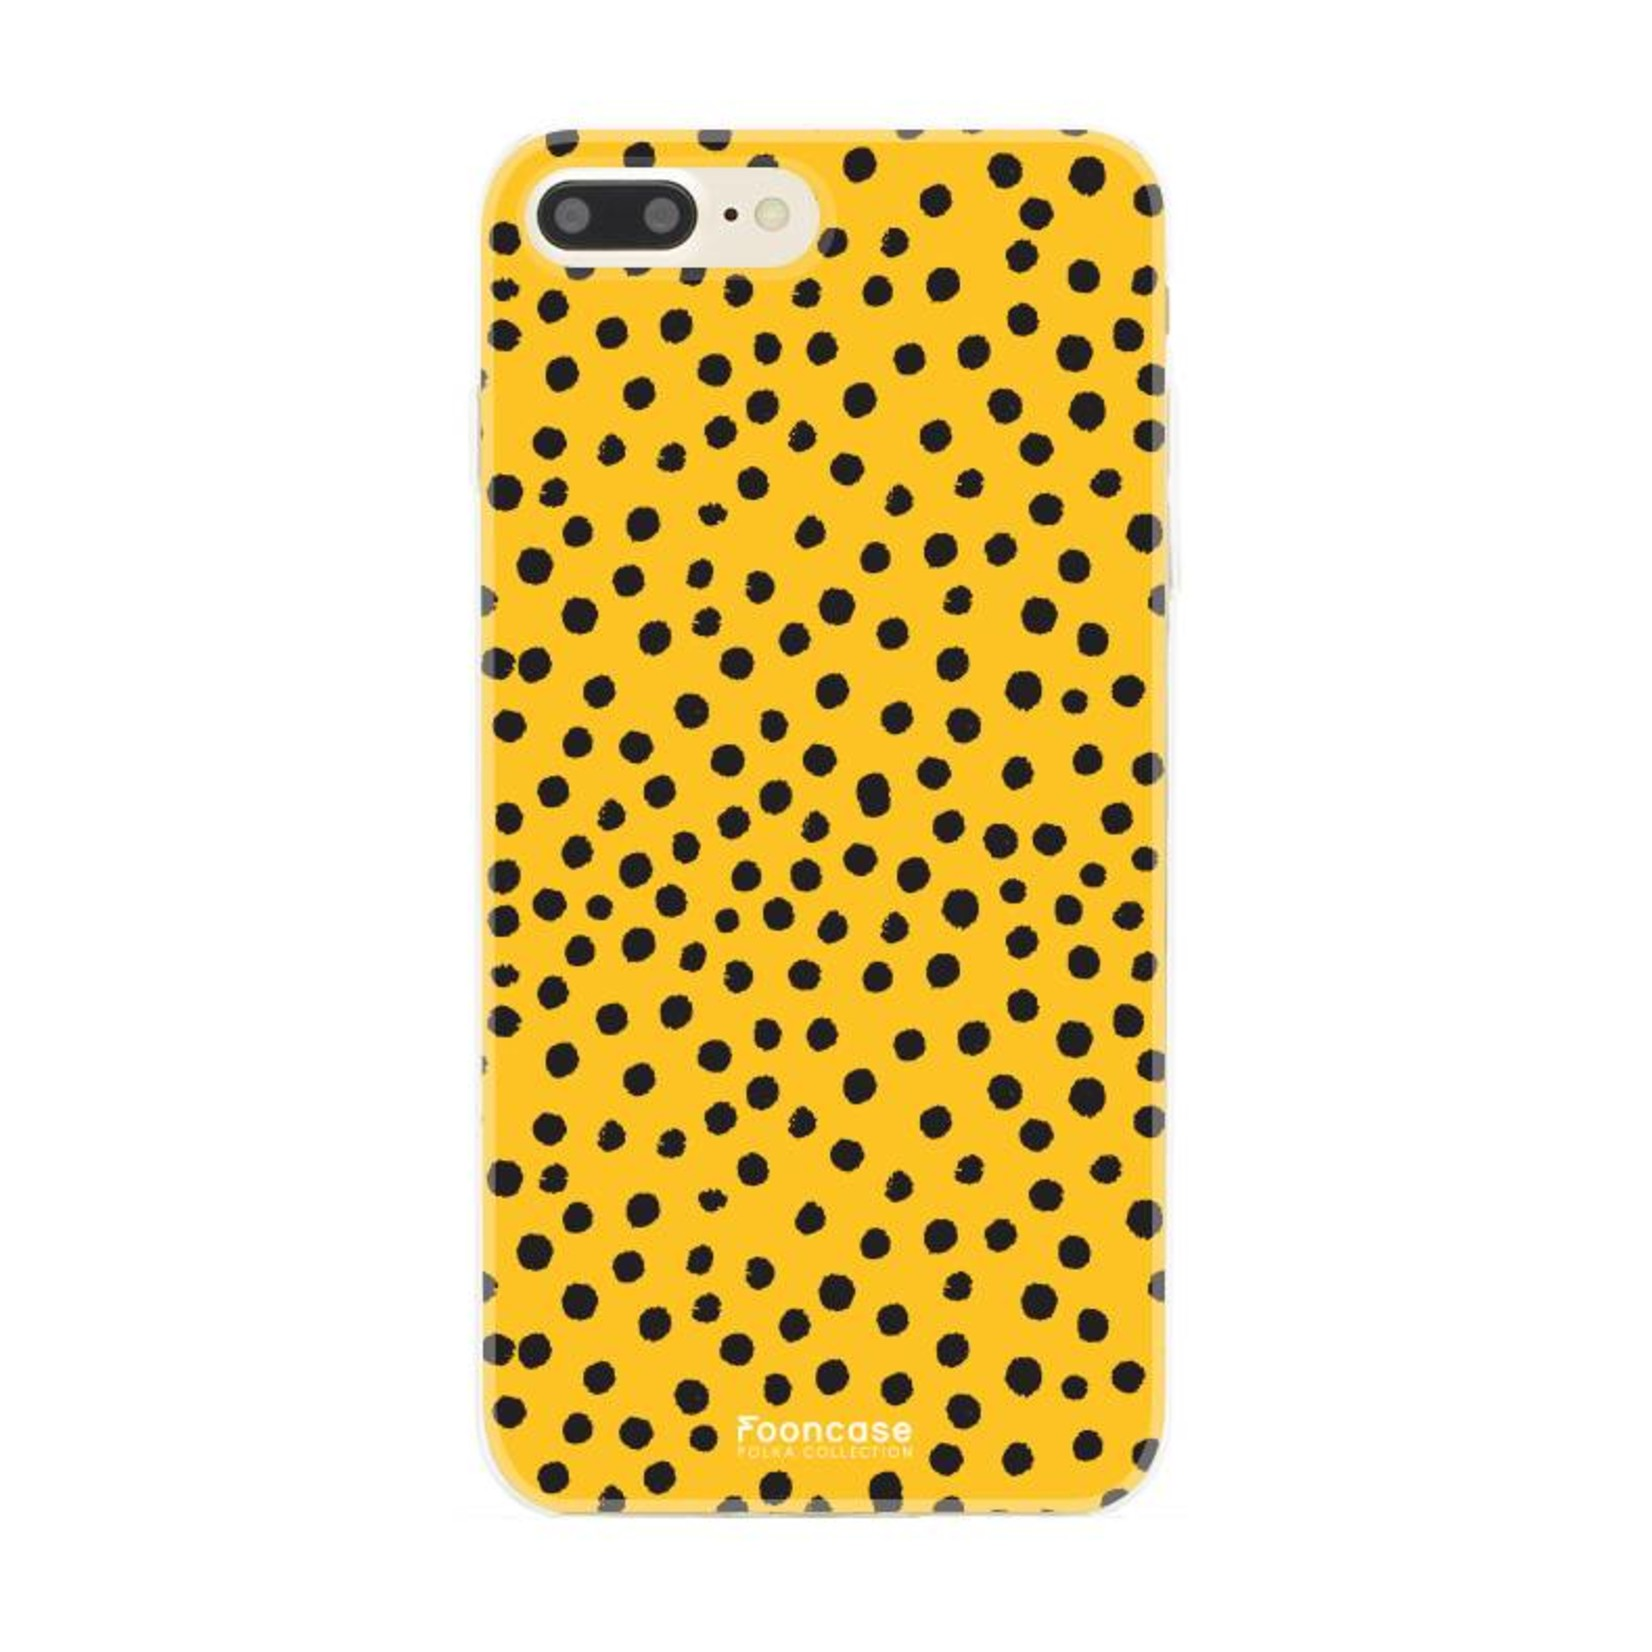 FOONCASE iPhone 7 Plus hoesje TPU Soft Case - Back Cover - POLKA COLLECTION / Stipjes / Stippen / Oker Geel